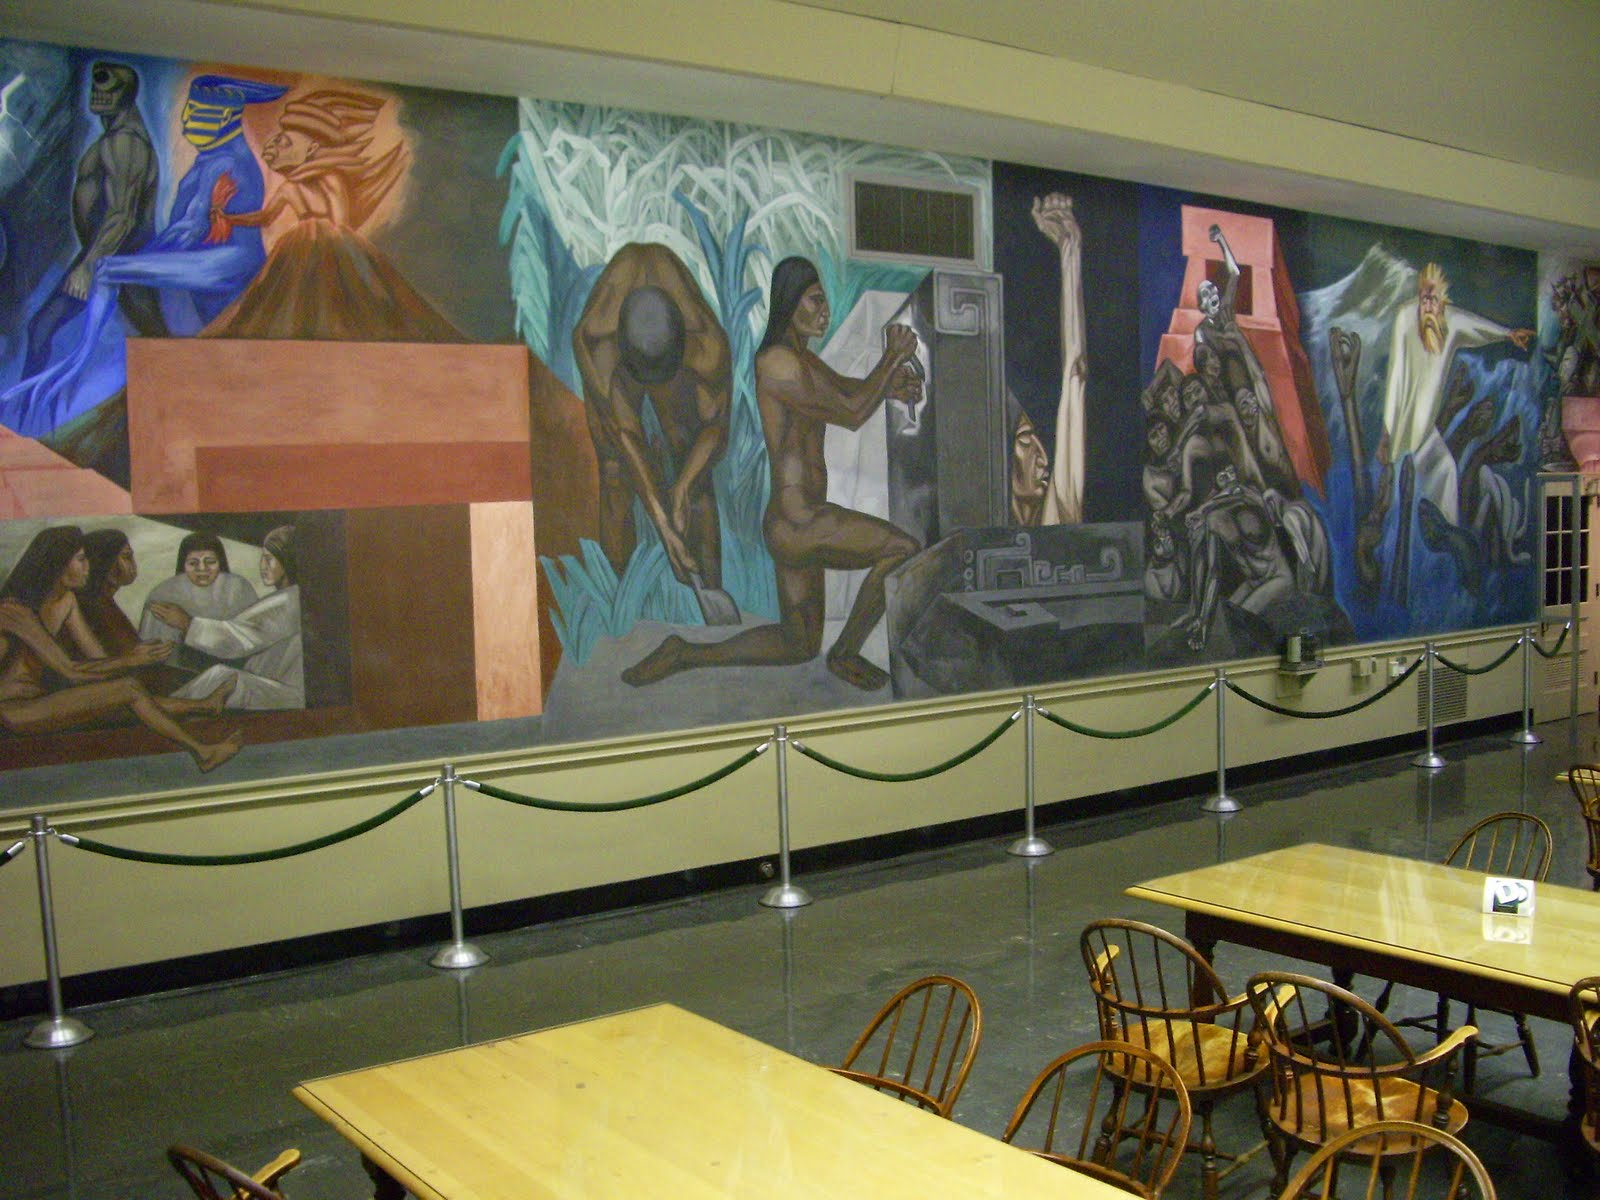 Er mundo de manu jose clemente orozco obras murales for Dartmouth mural